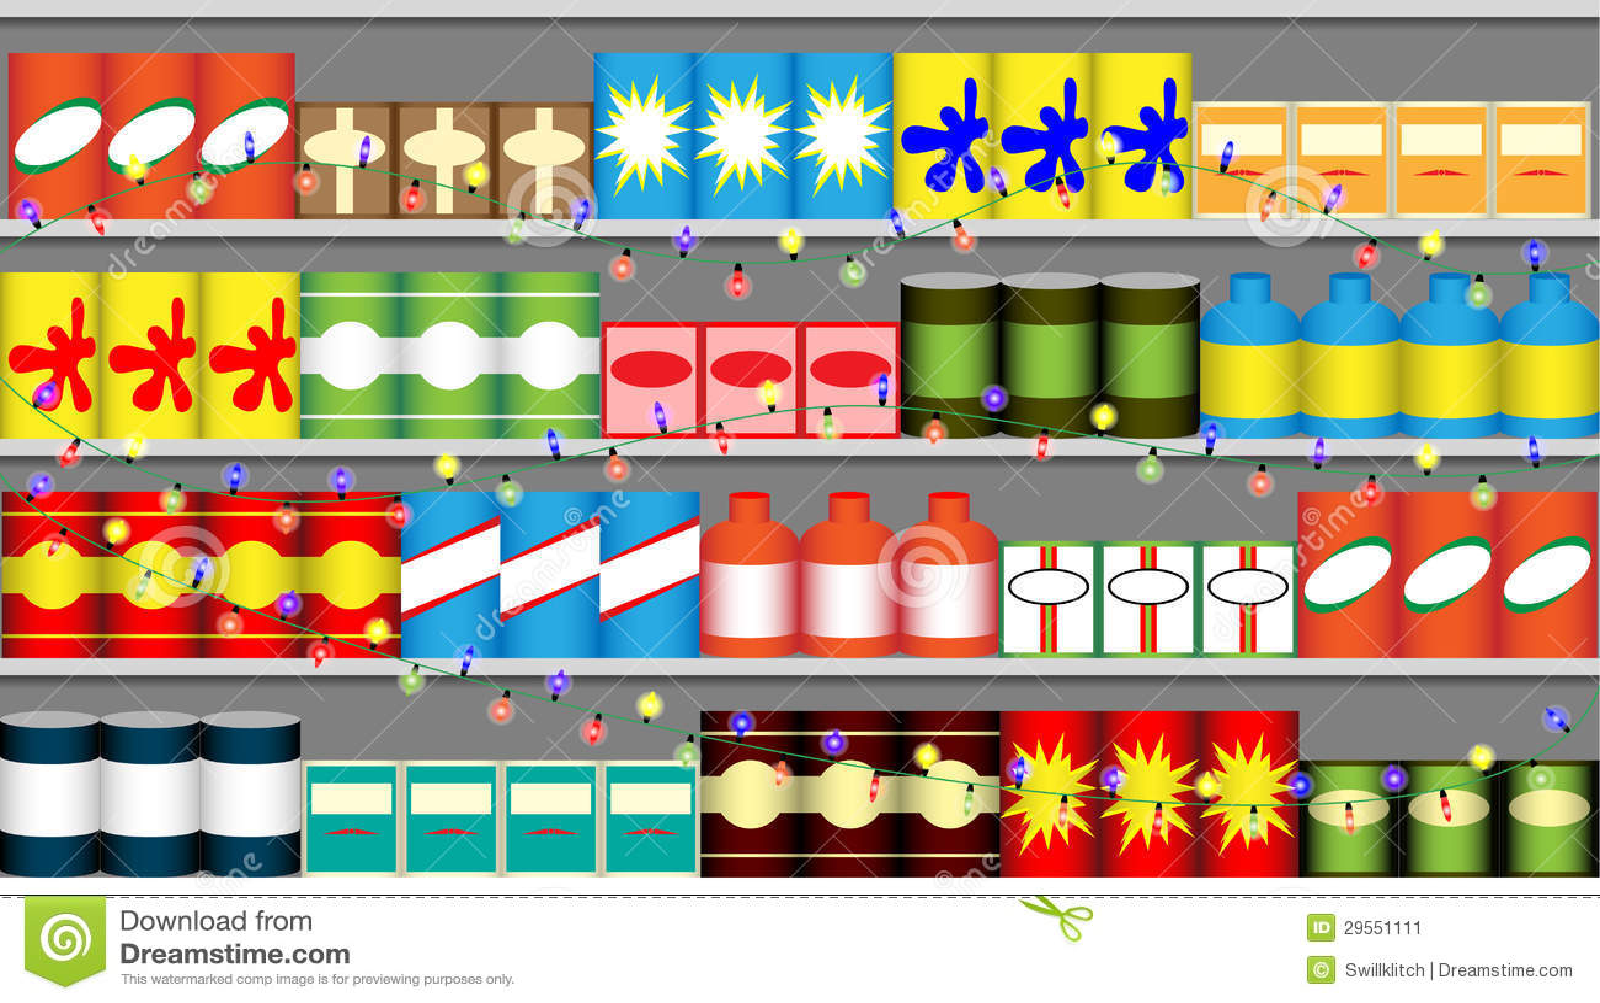 Supermarket półki z girlandami